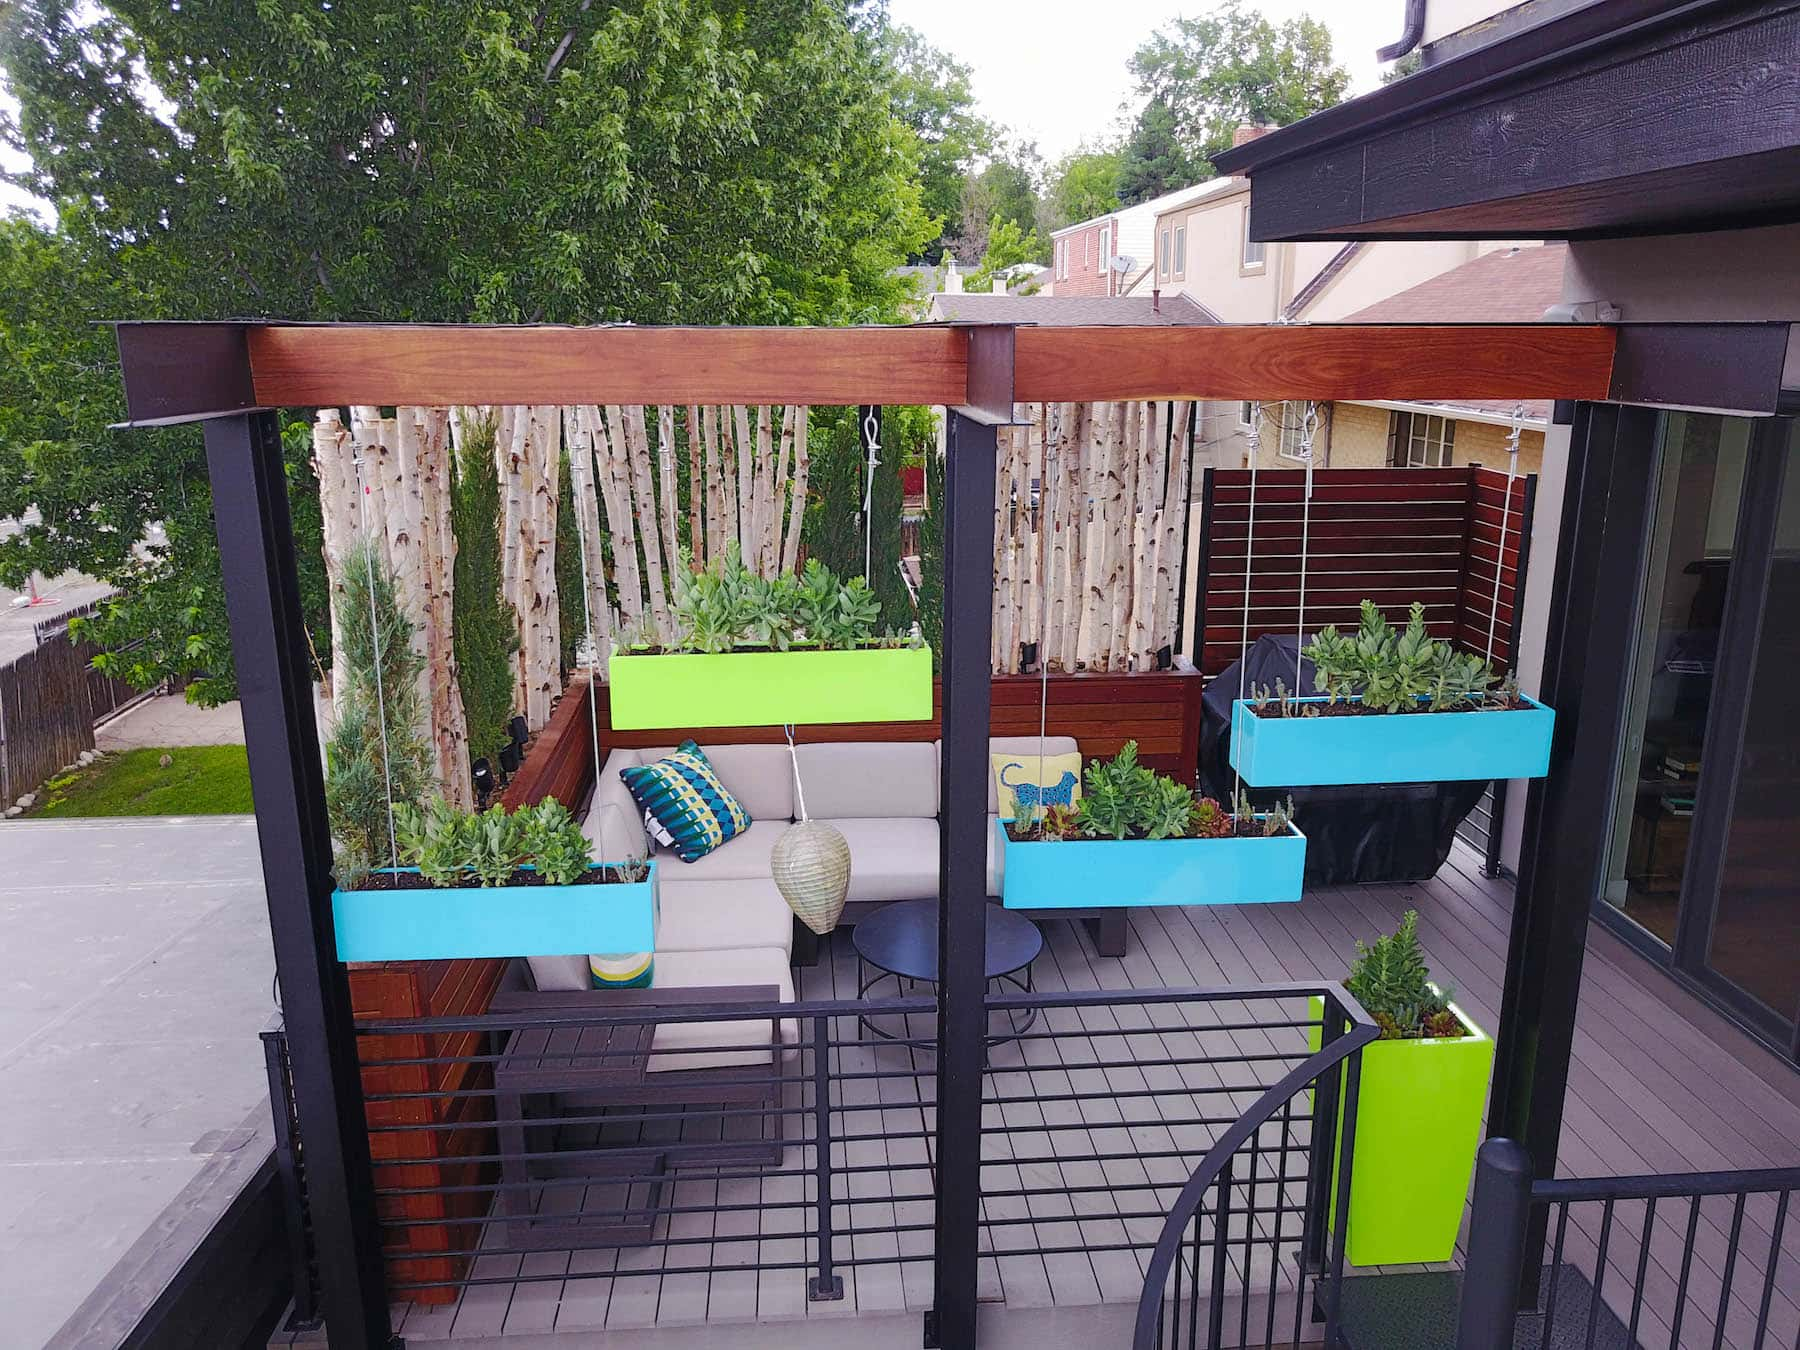 Pergola With Hanging Planters